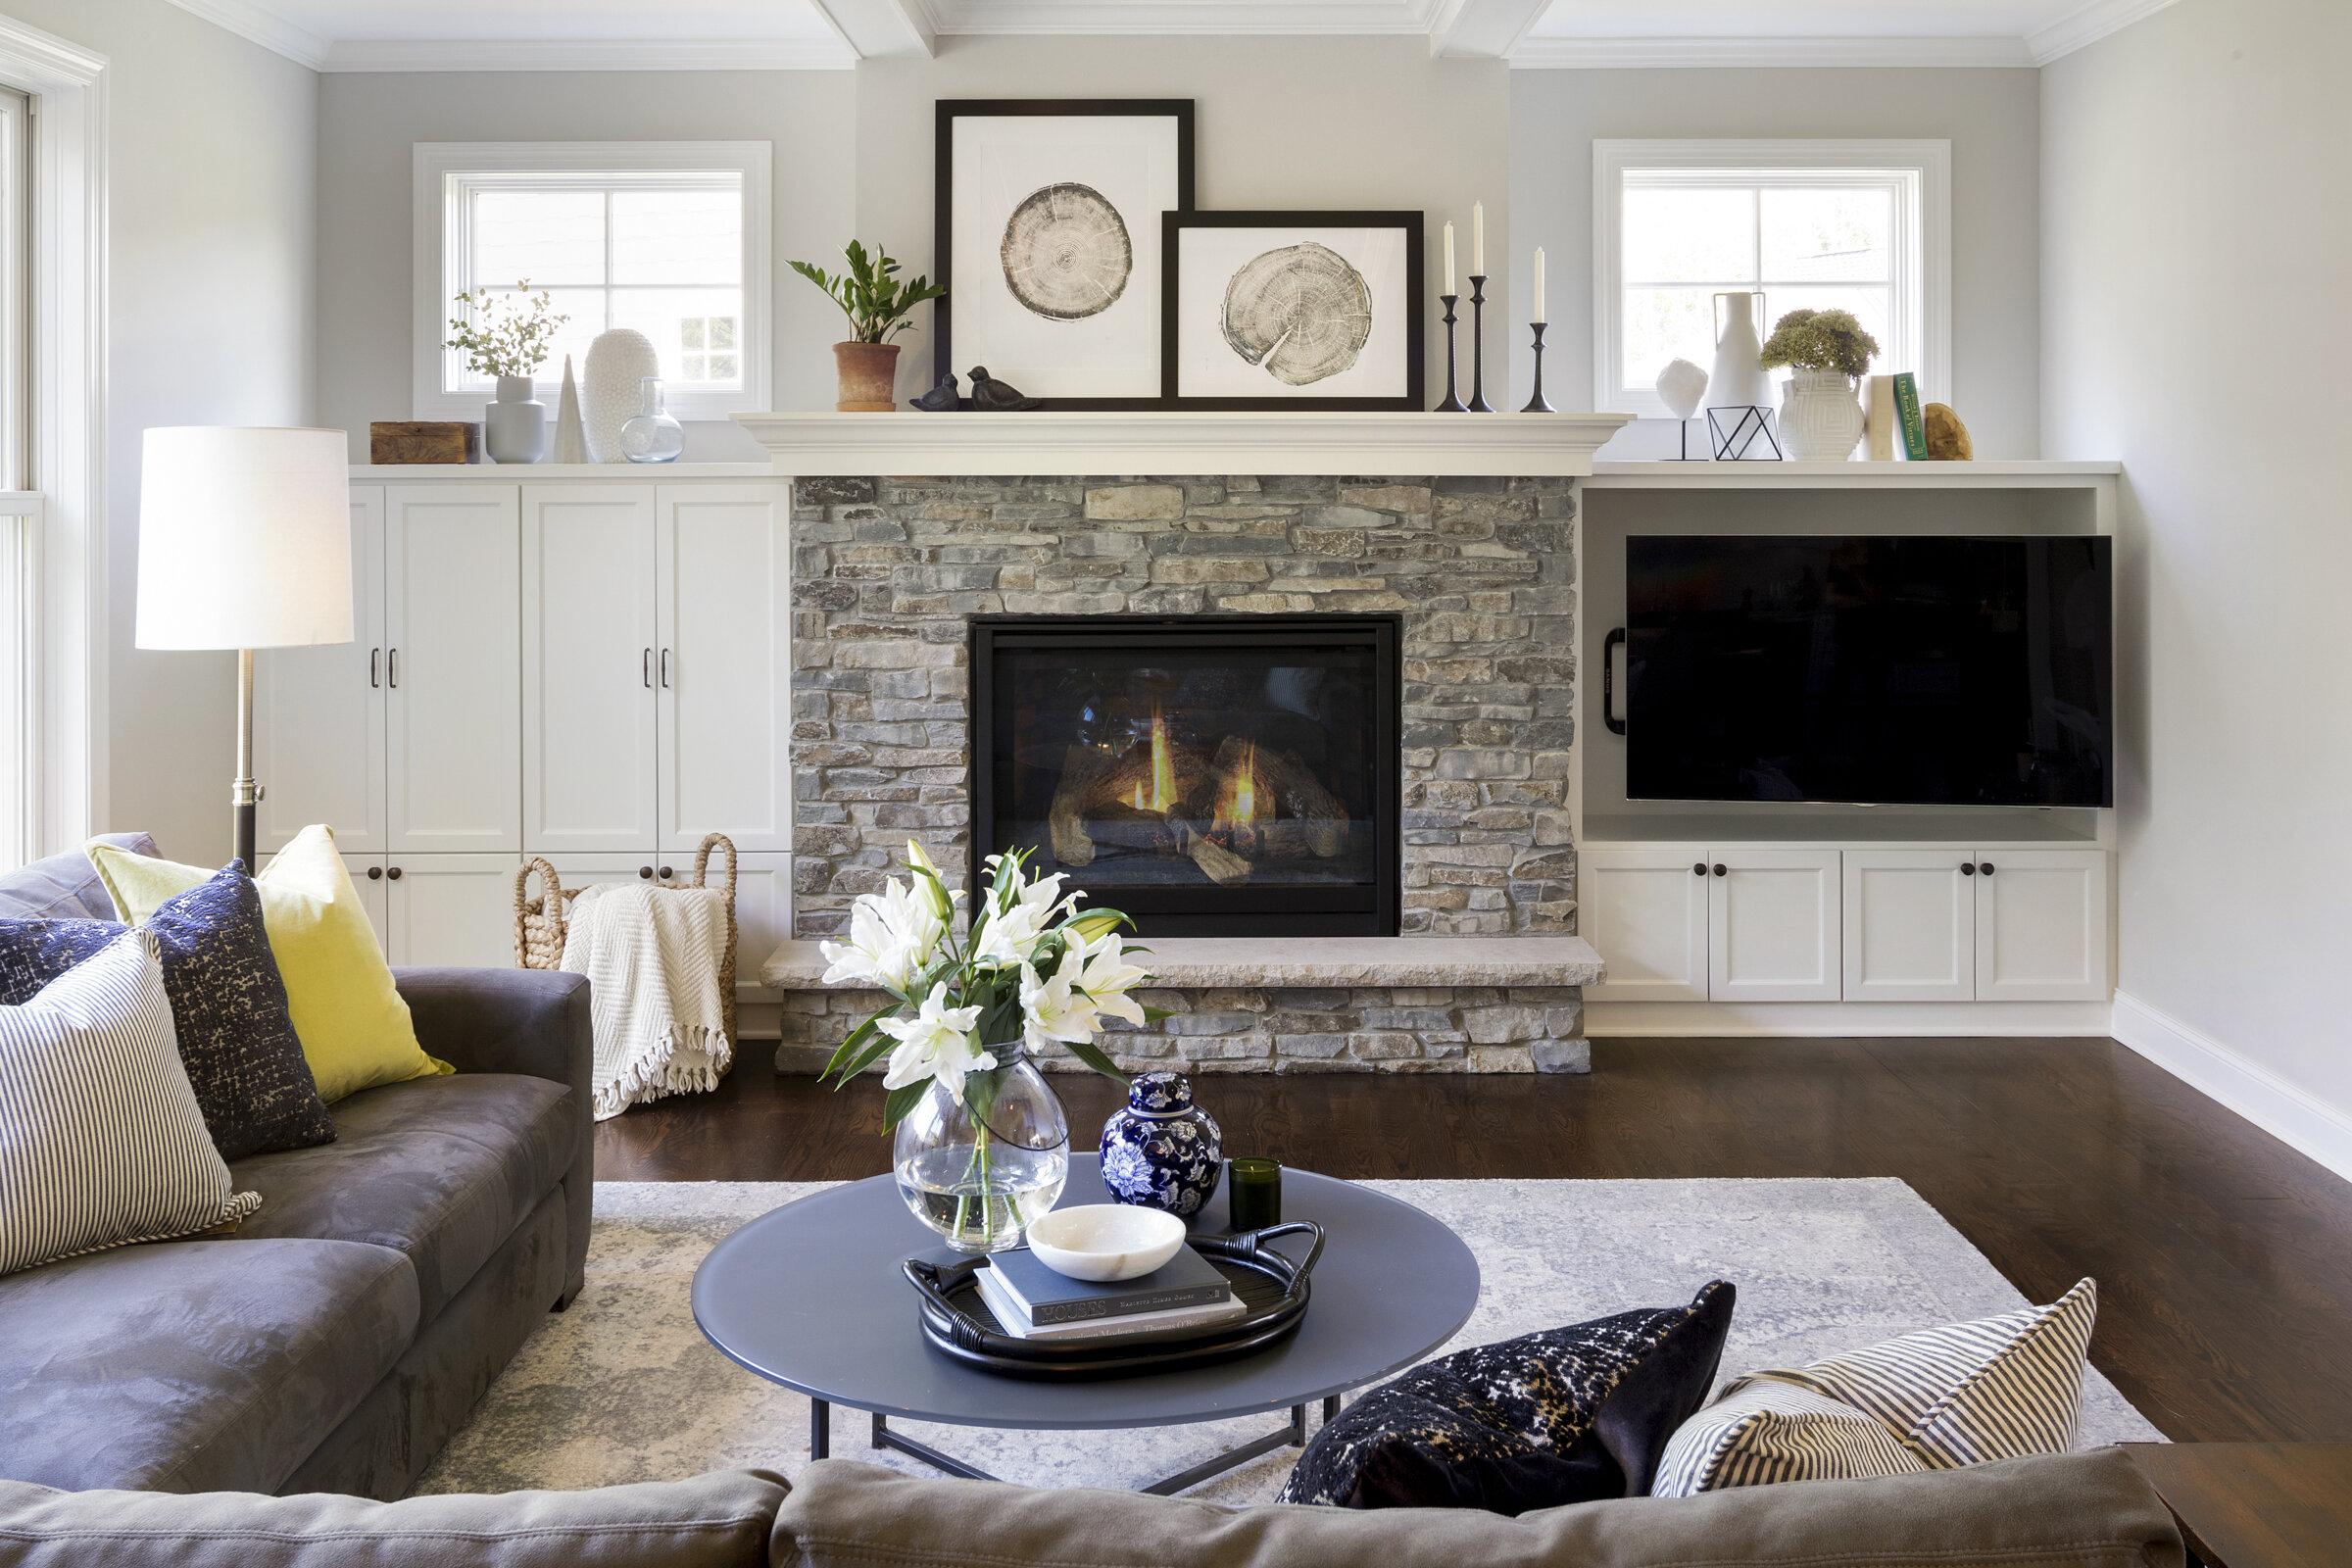 7 Valuable Benefits Of Hiring An Interior Designer Laura Engen Interior Design